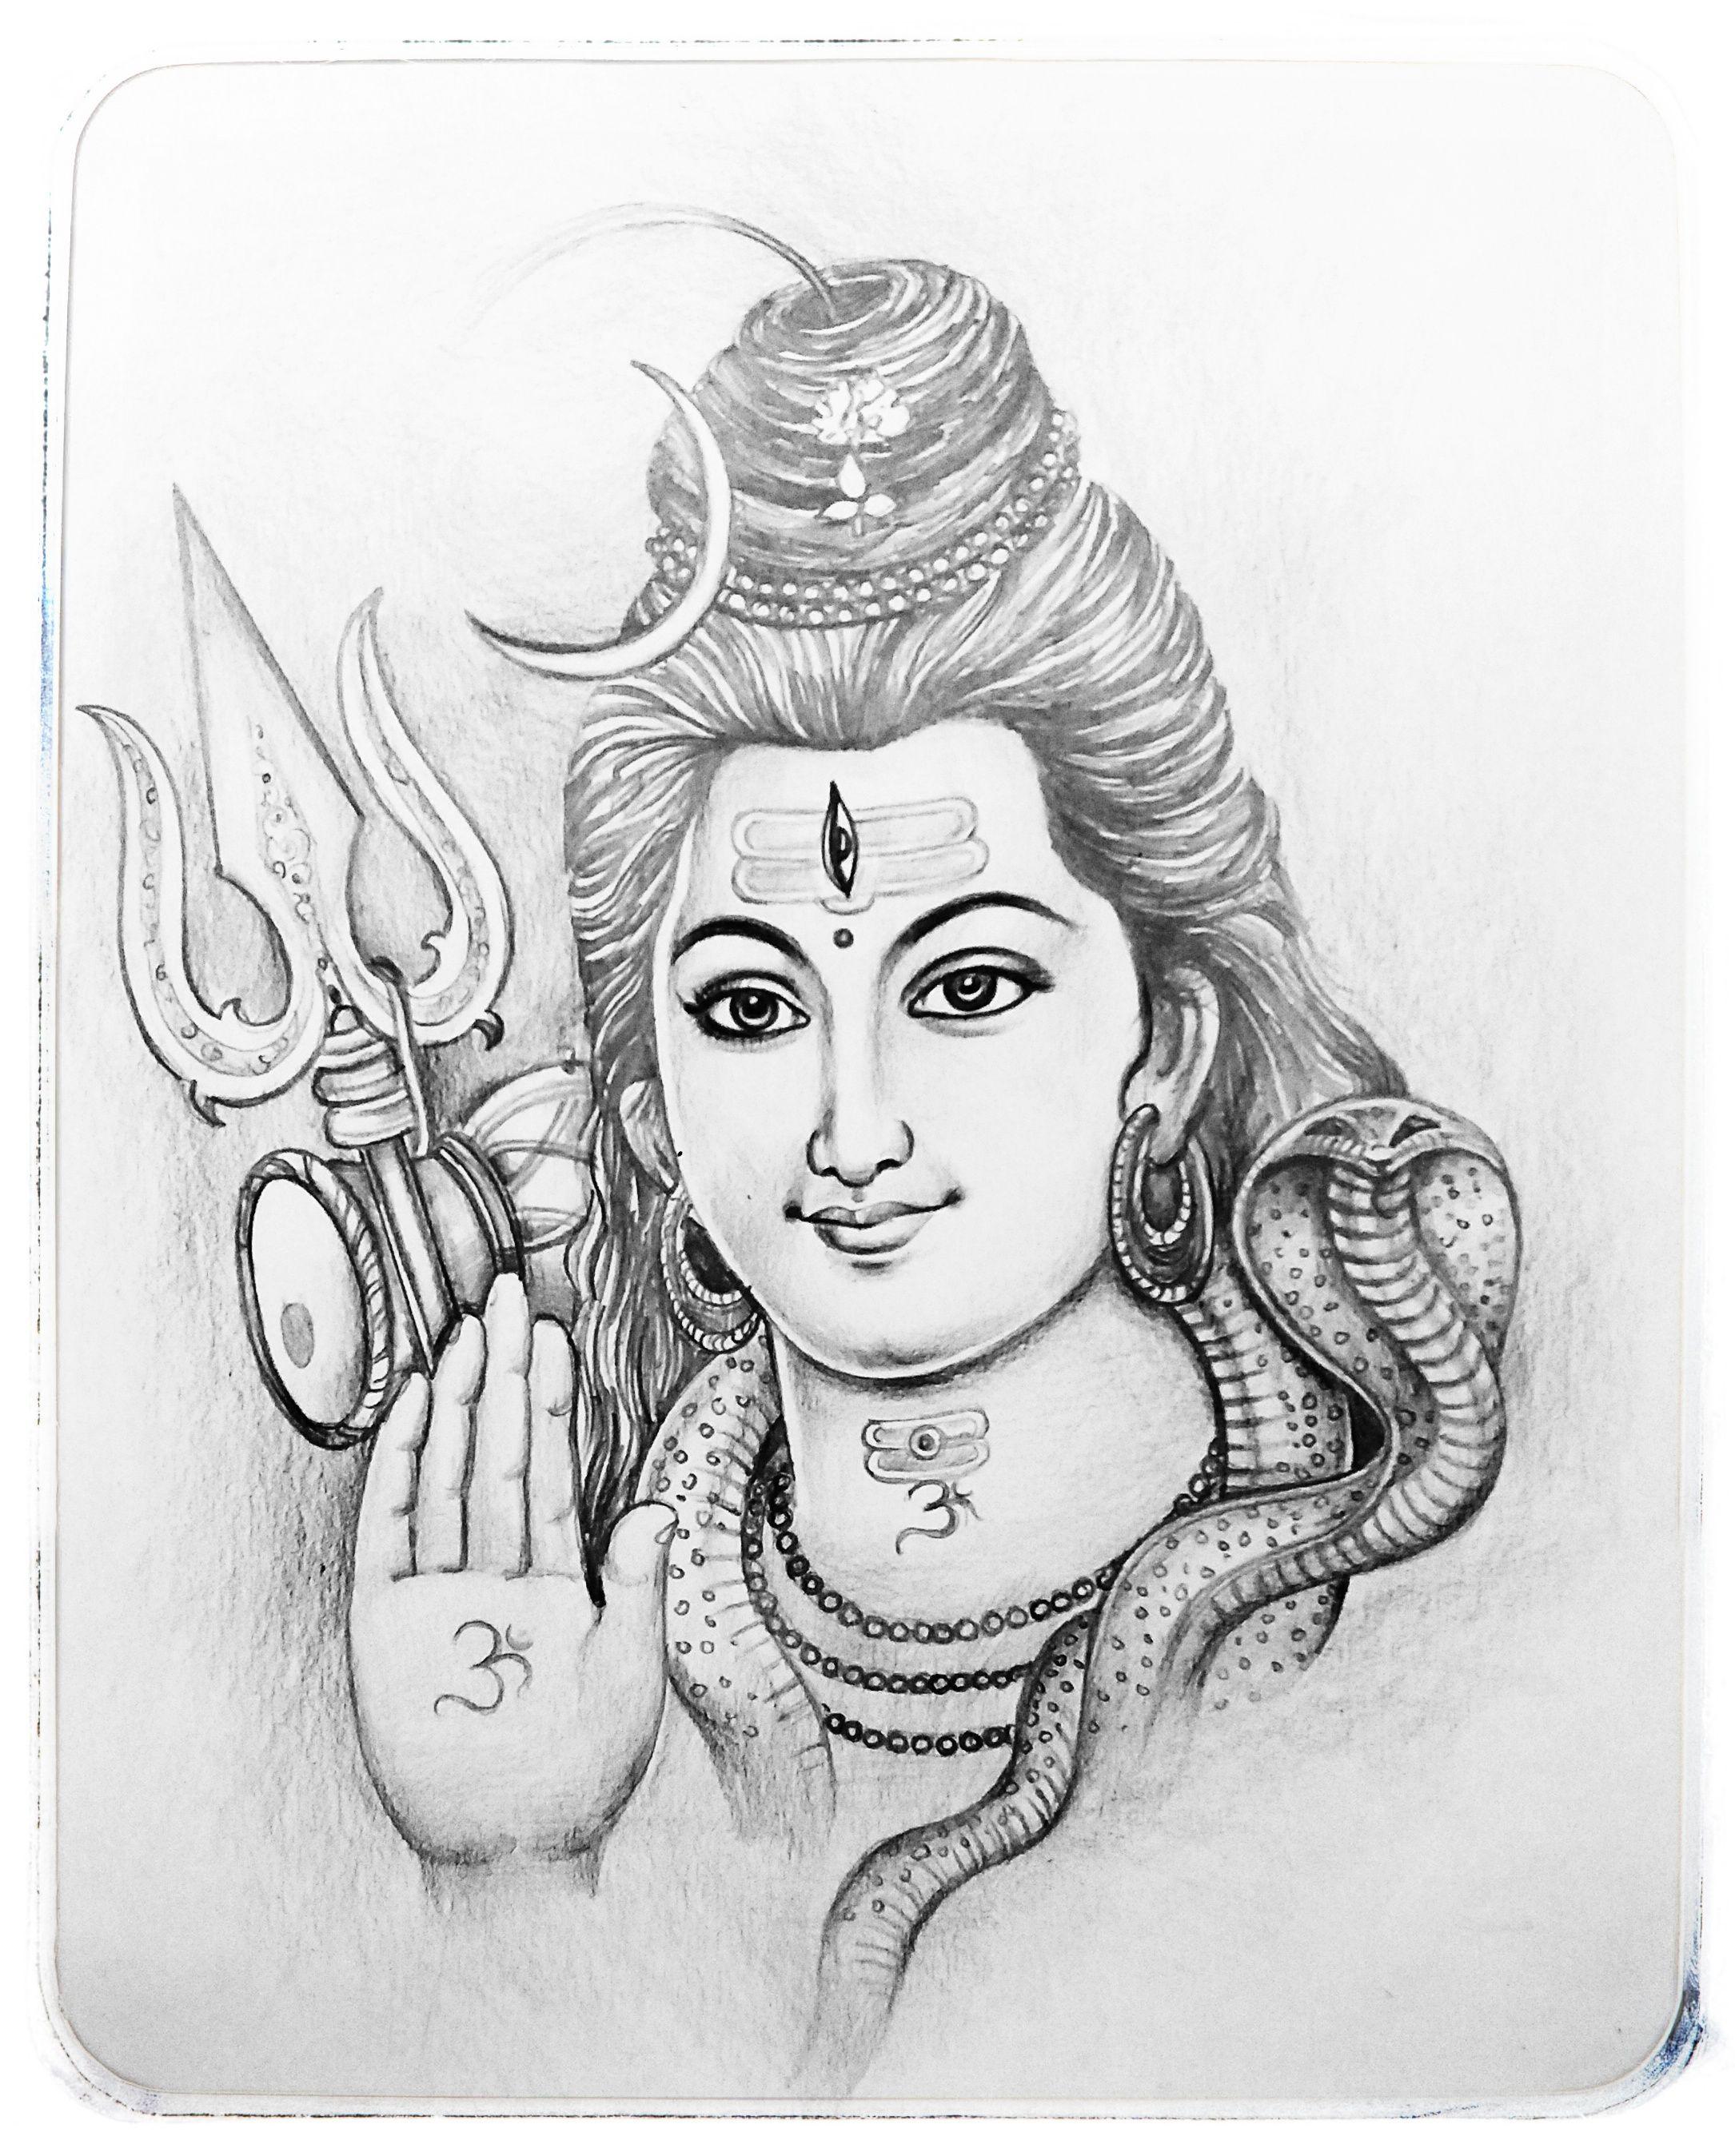 Lord Shiva Pencil Sketch In 2020 Art Drawings Sketches Creative Art Drawings Sketches Simple Art Tutorials Drawing